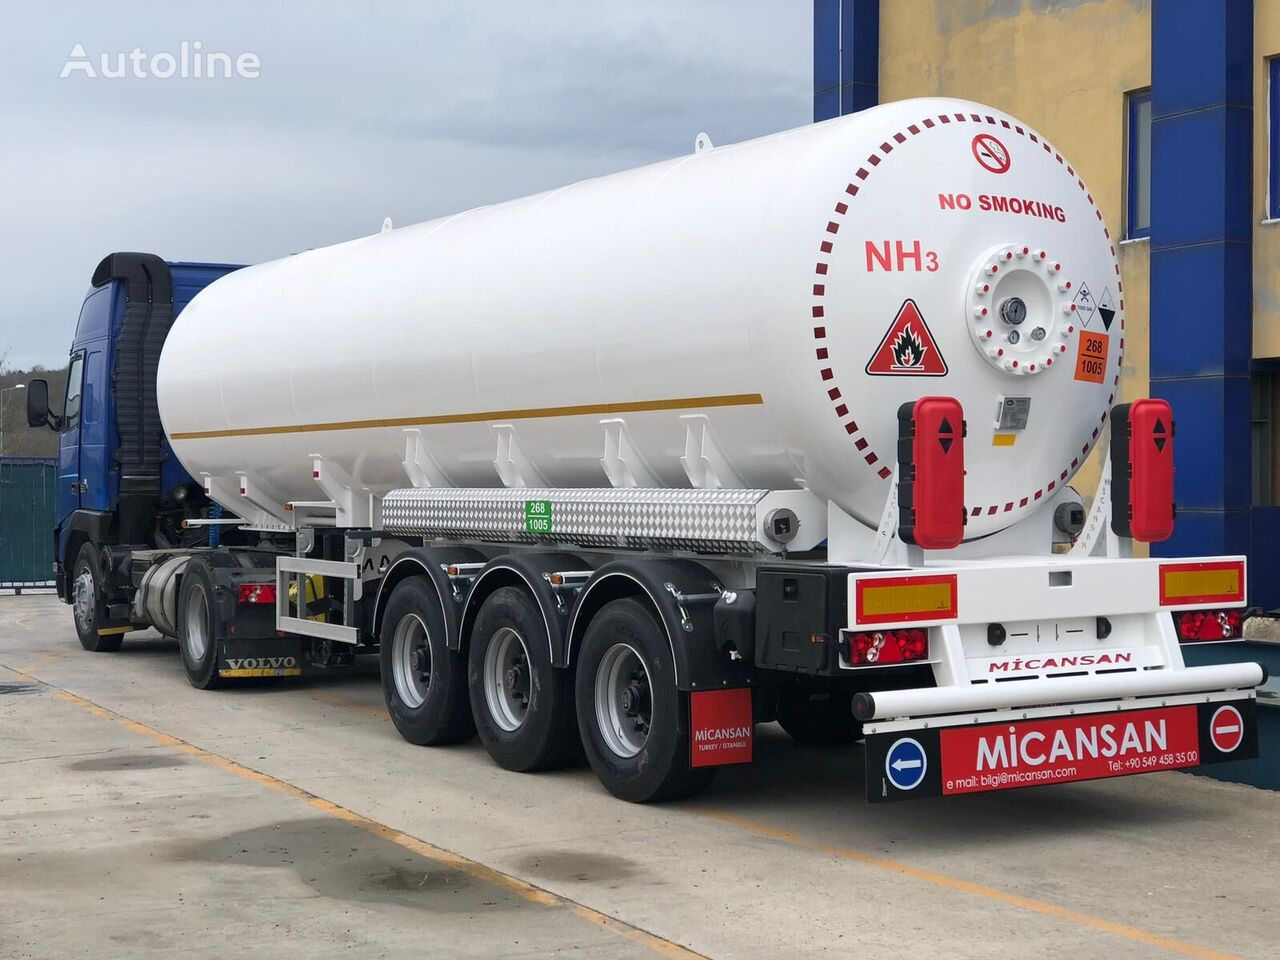 nowa cysterna gazowa Micansan 2019 45 m3 excellent product 3 axles 6 tıres